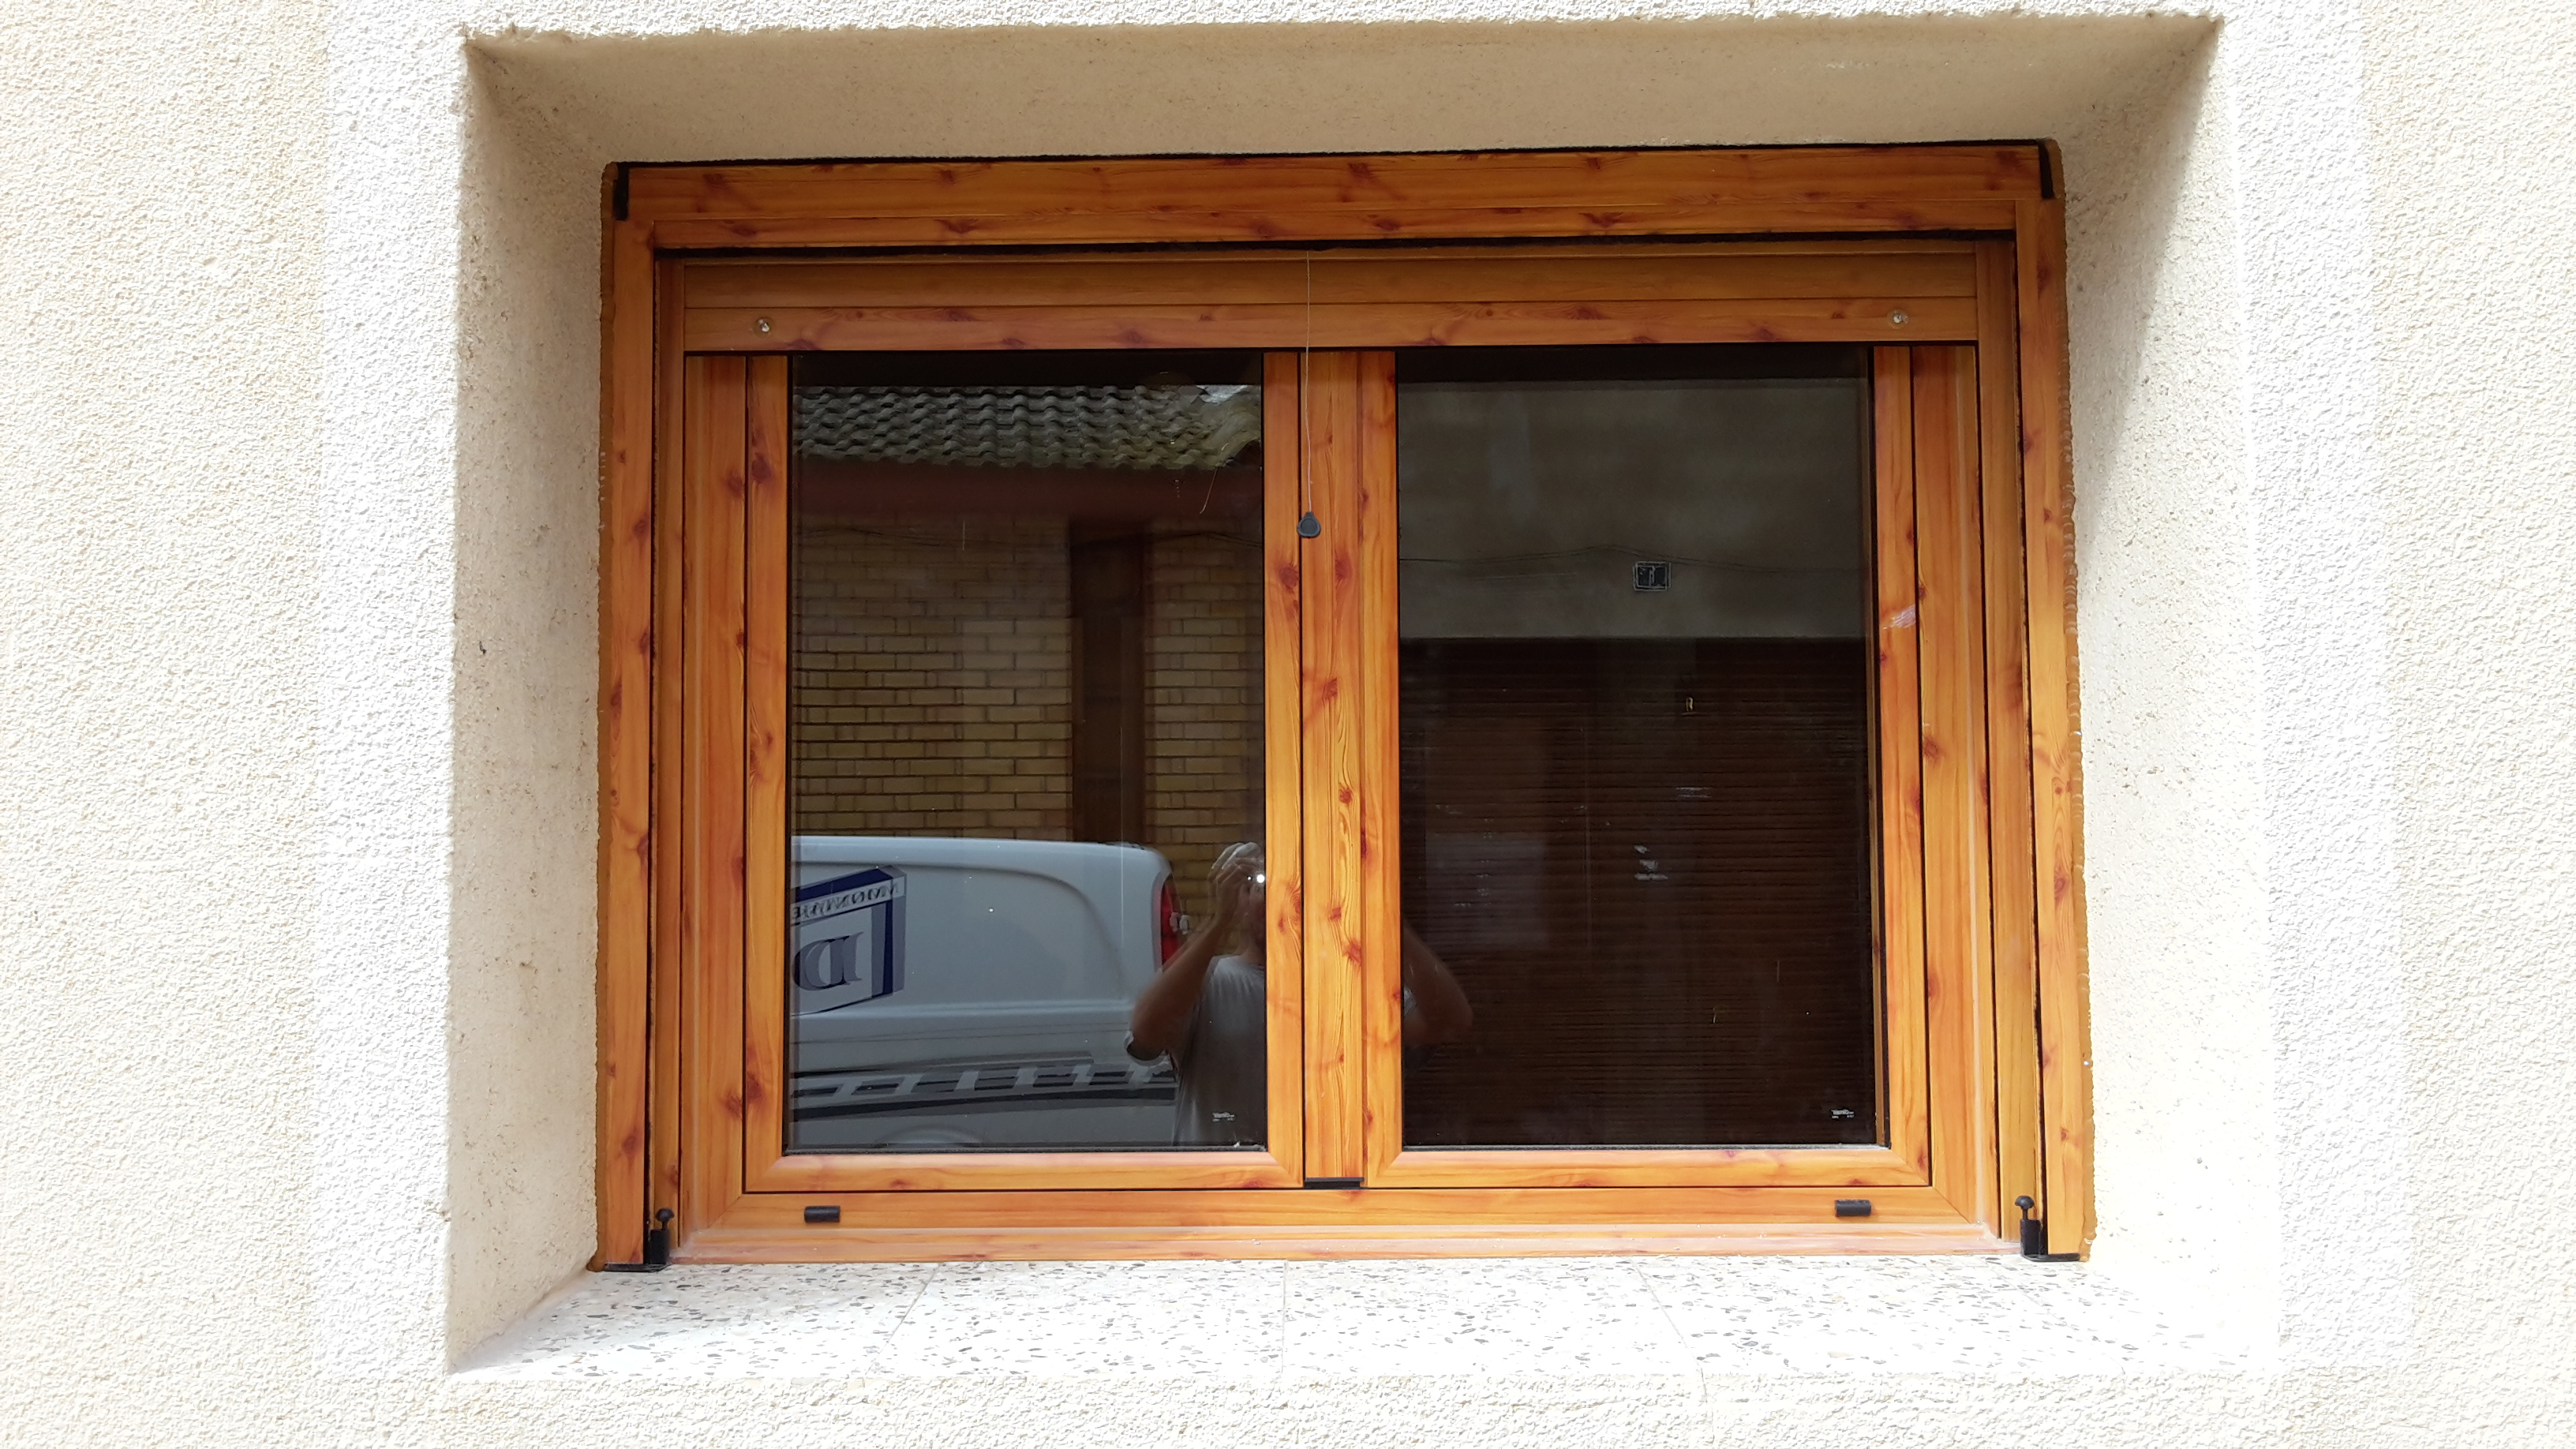 Montaje ventanas de aluminio montajes de aluminio dg for Ventanas en madera